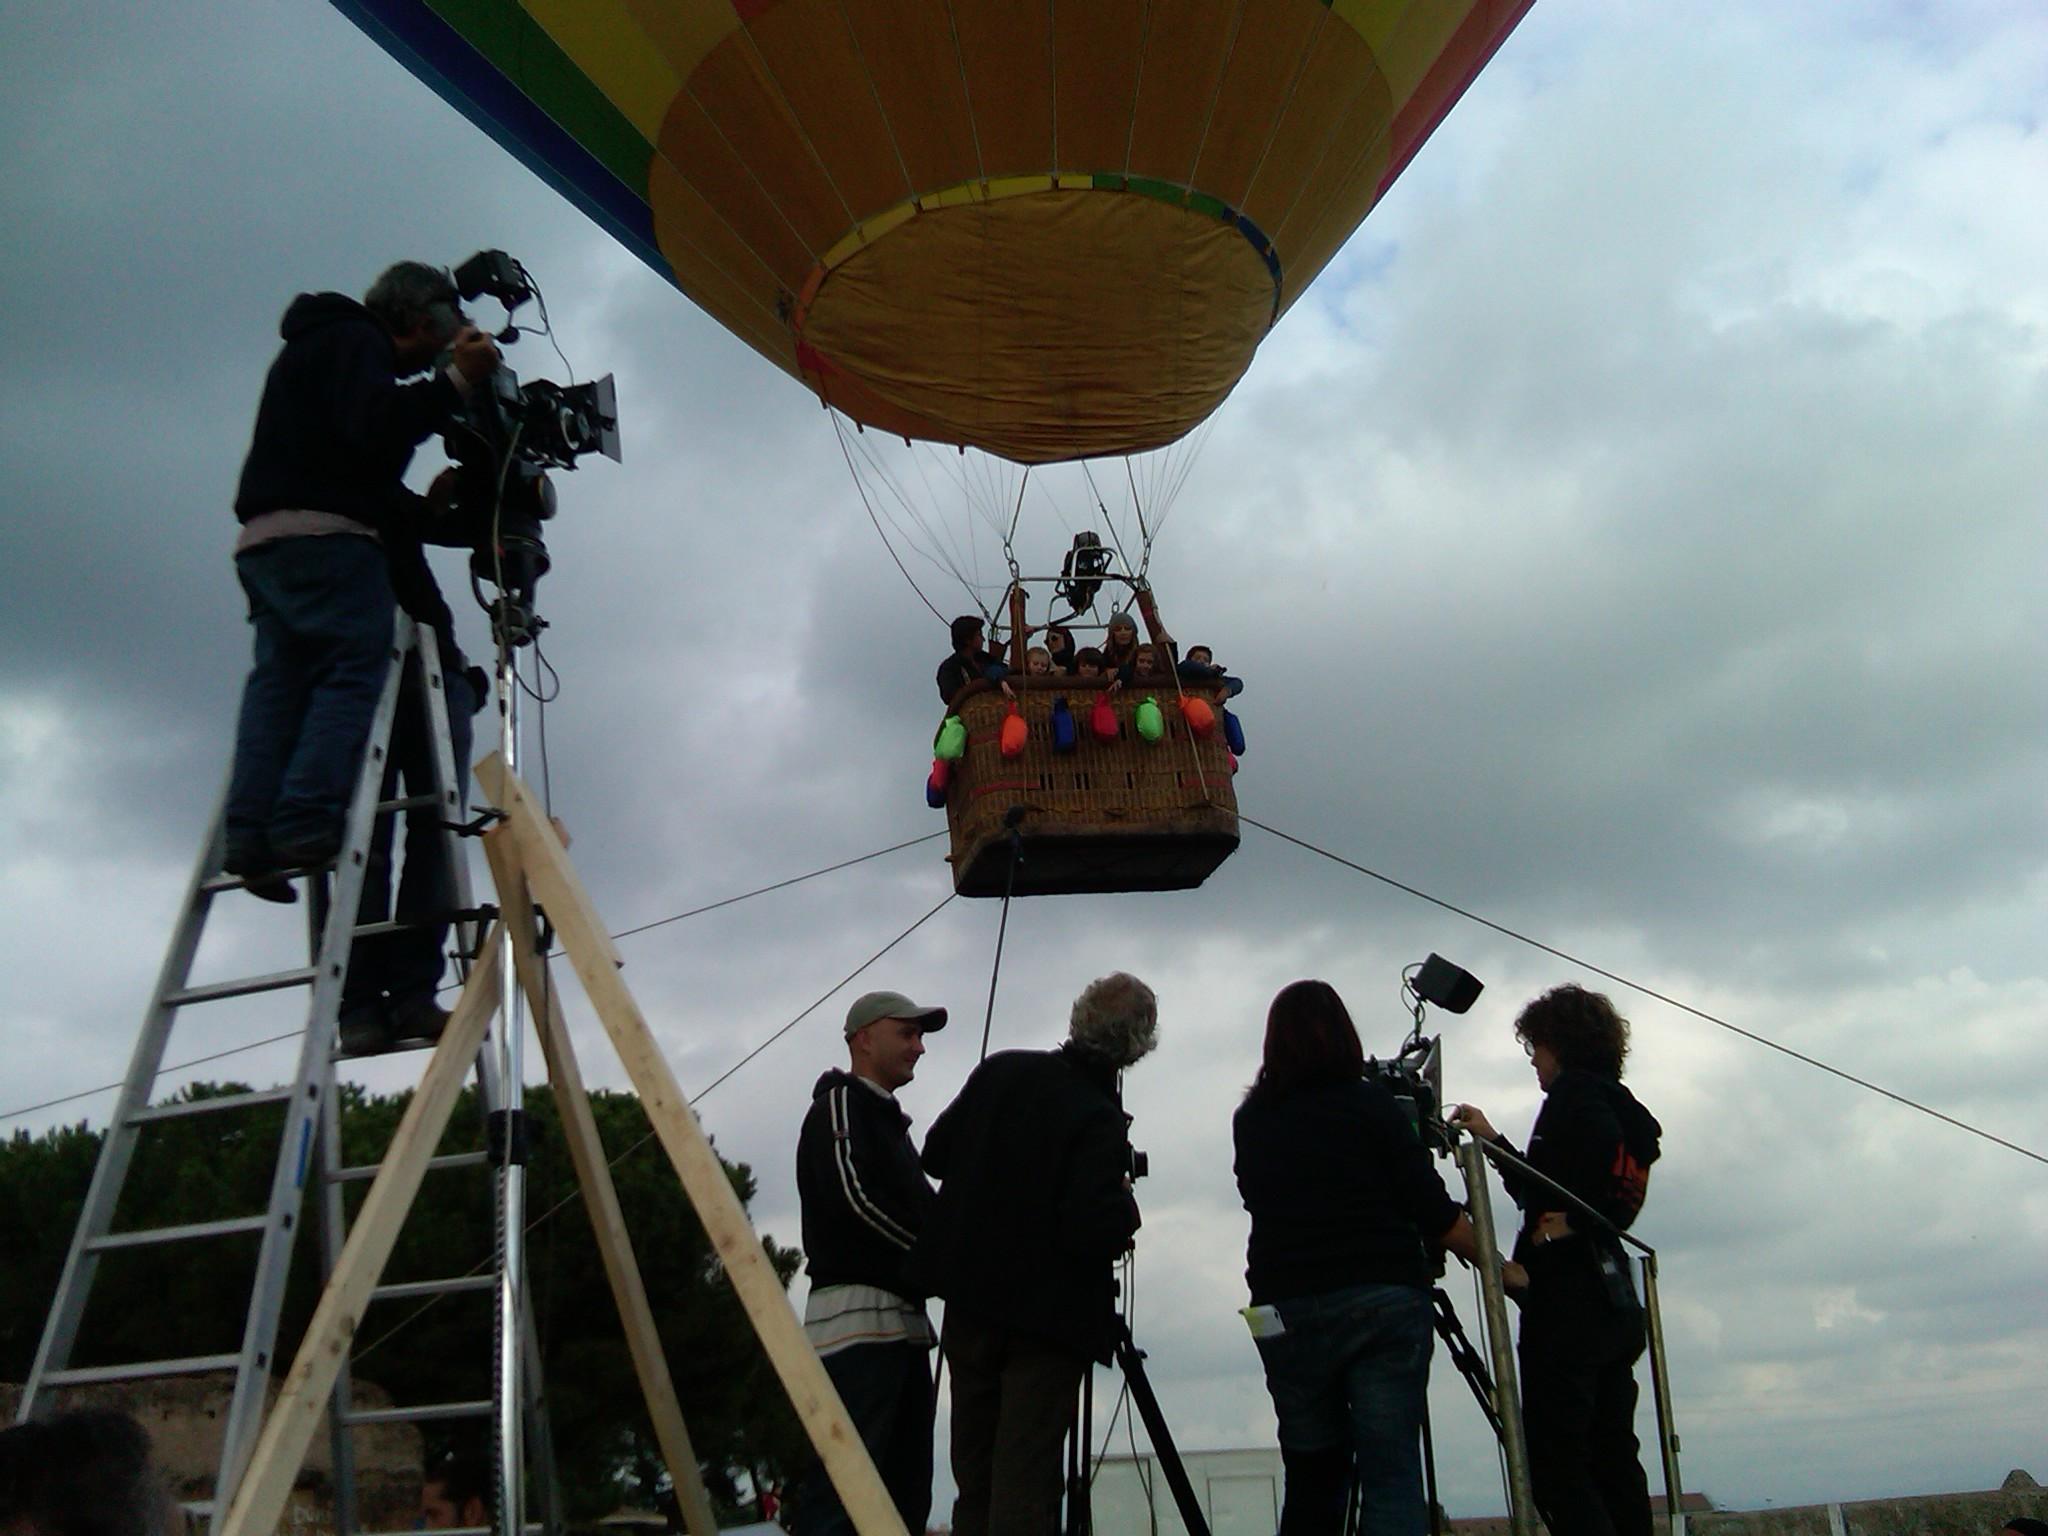 Ripresa cinematografica su una mongolfiera